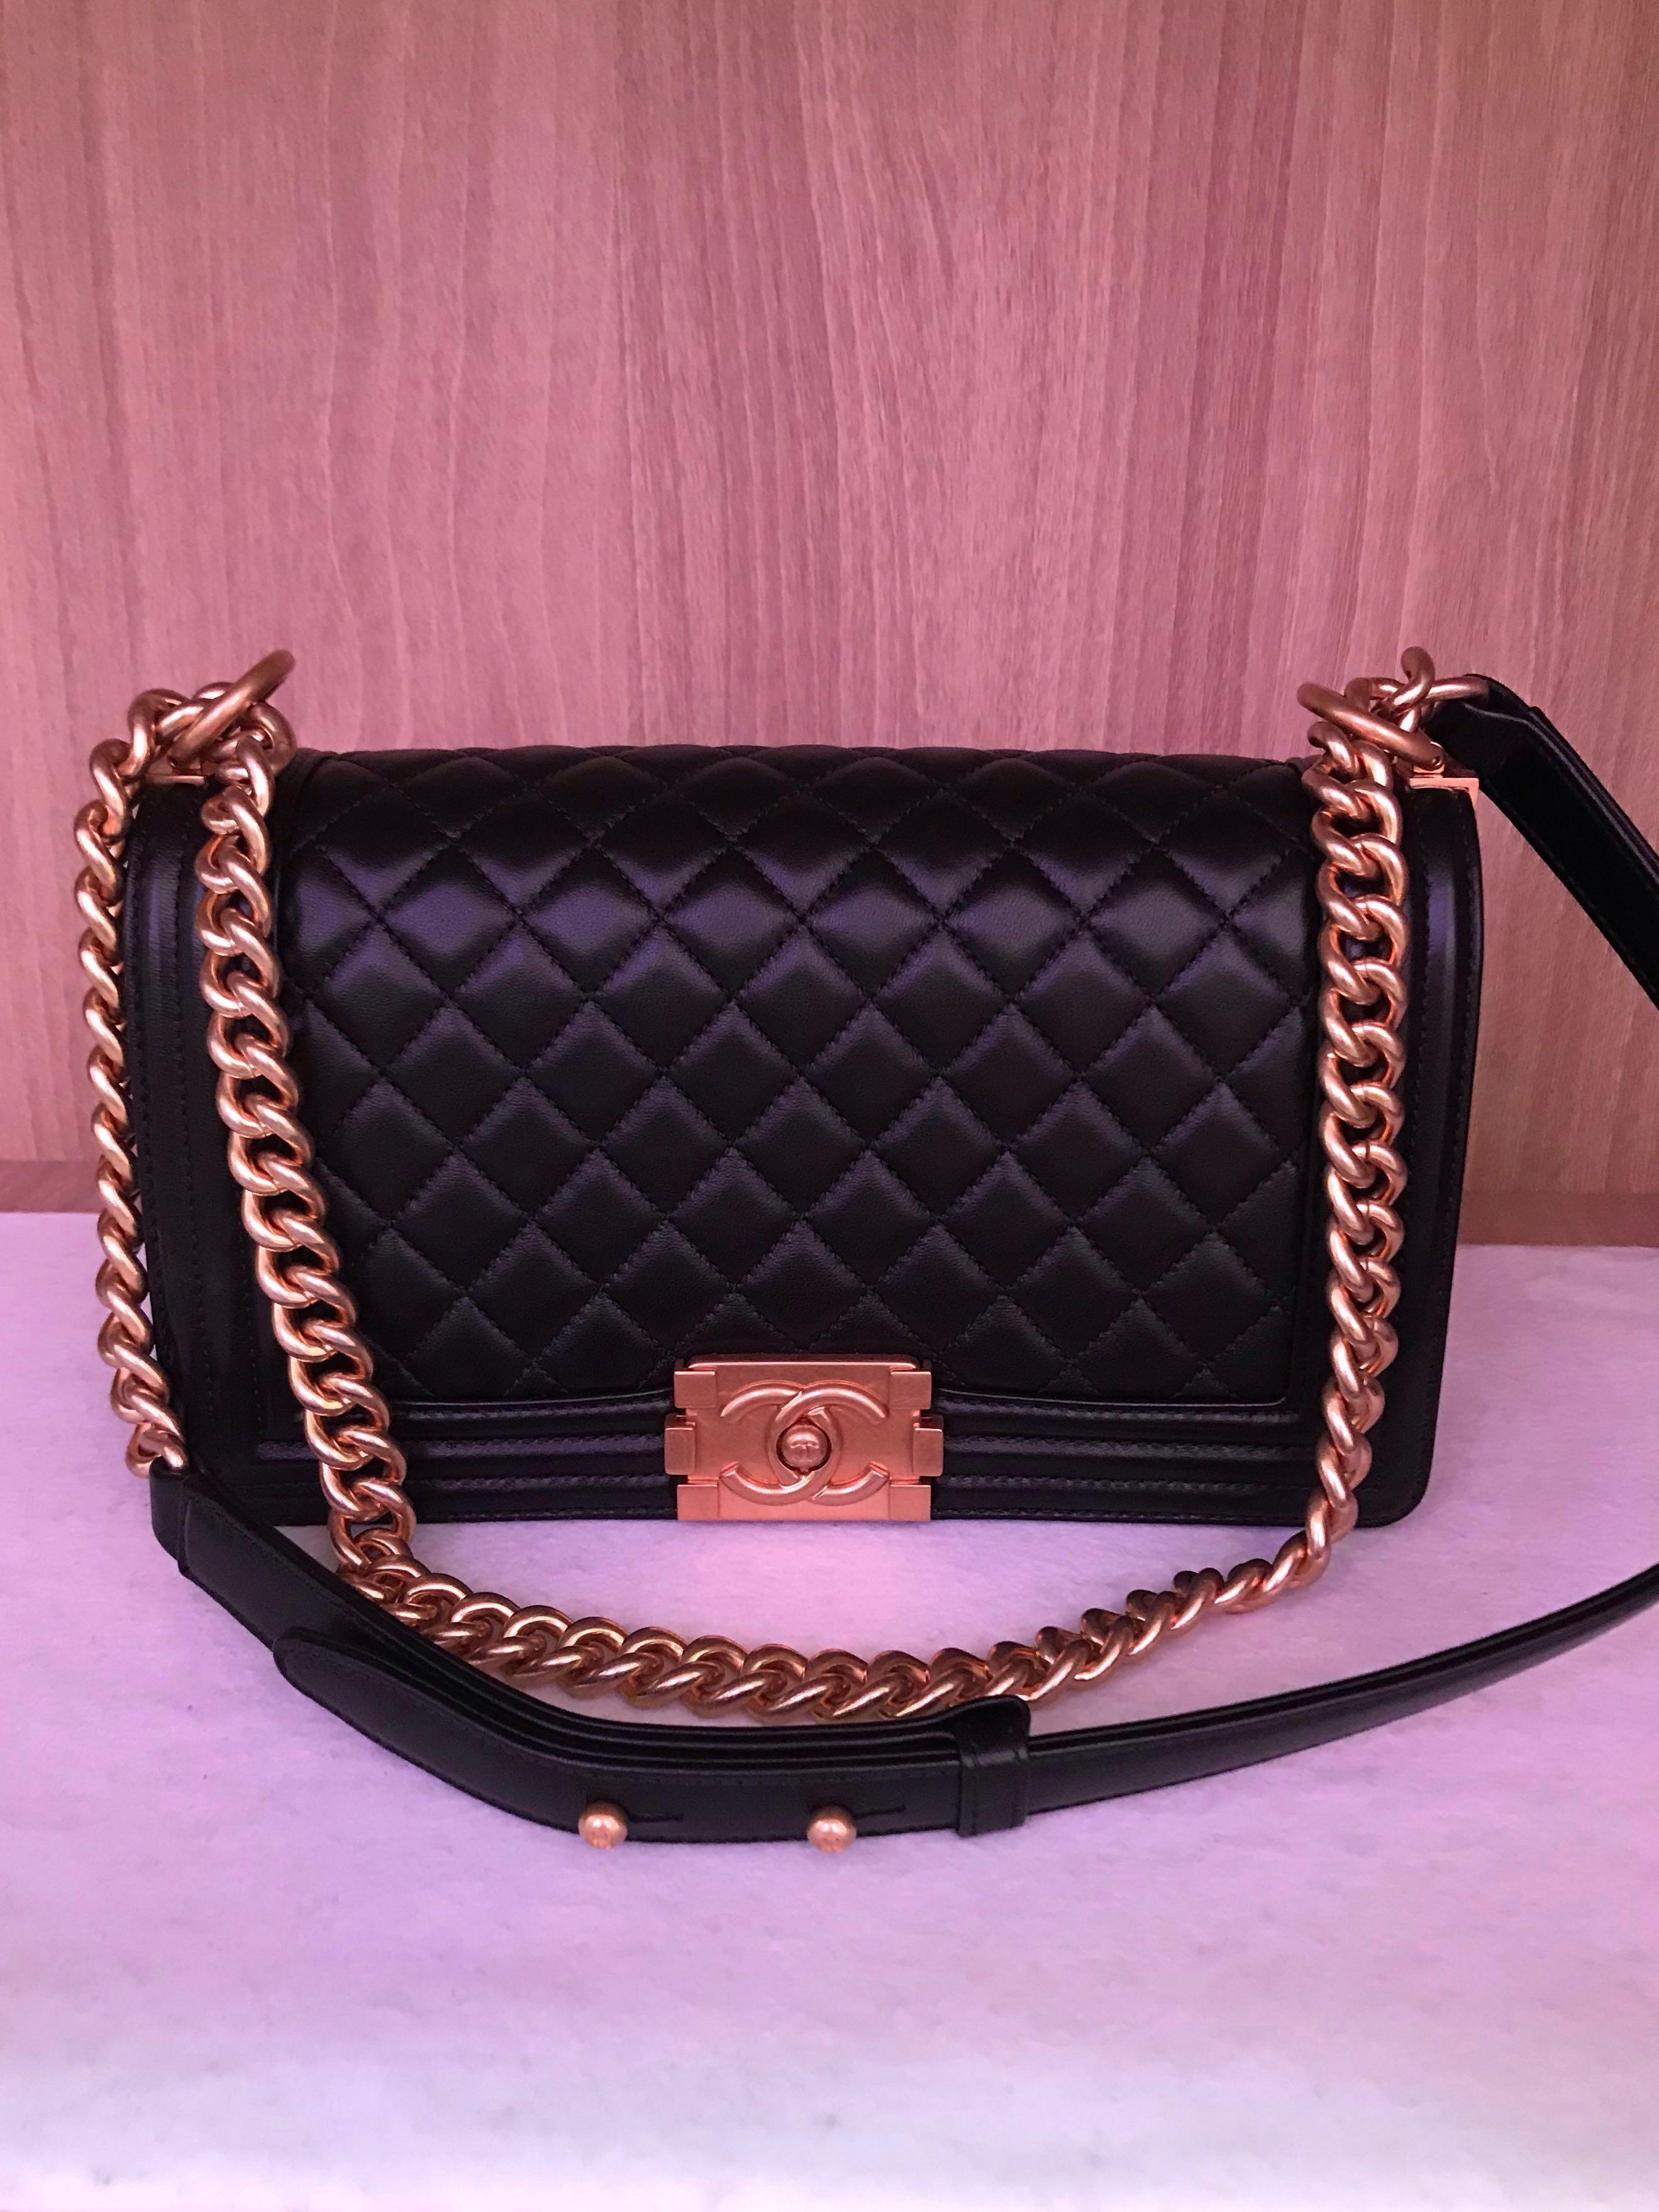 ce8112749f91 Chanel Boy medium lambskin Ghw full set with Boutique Receipt 2327xxxx,  Luxury, Bags & Wallets, Handbags on Carousell